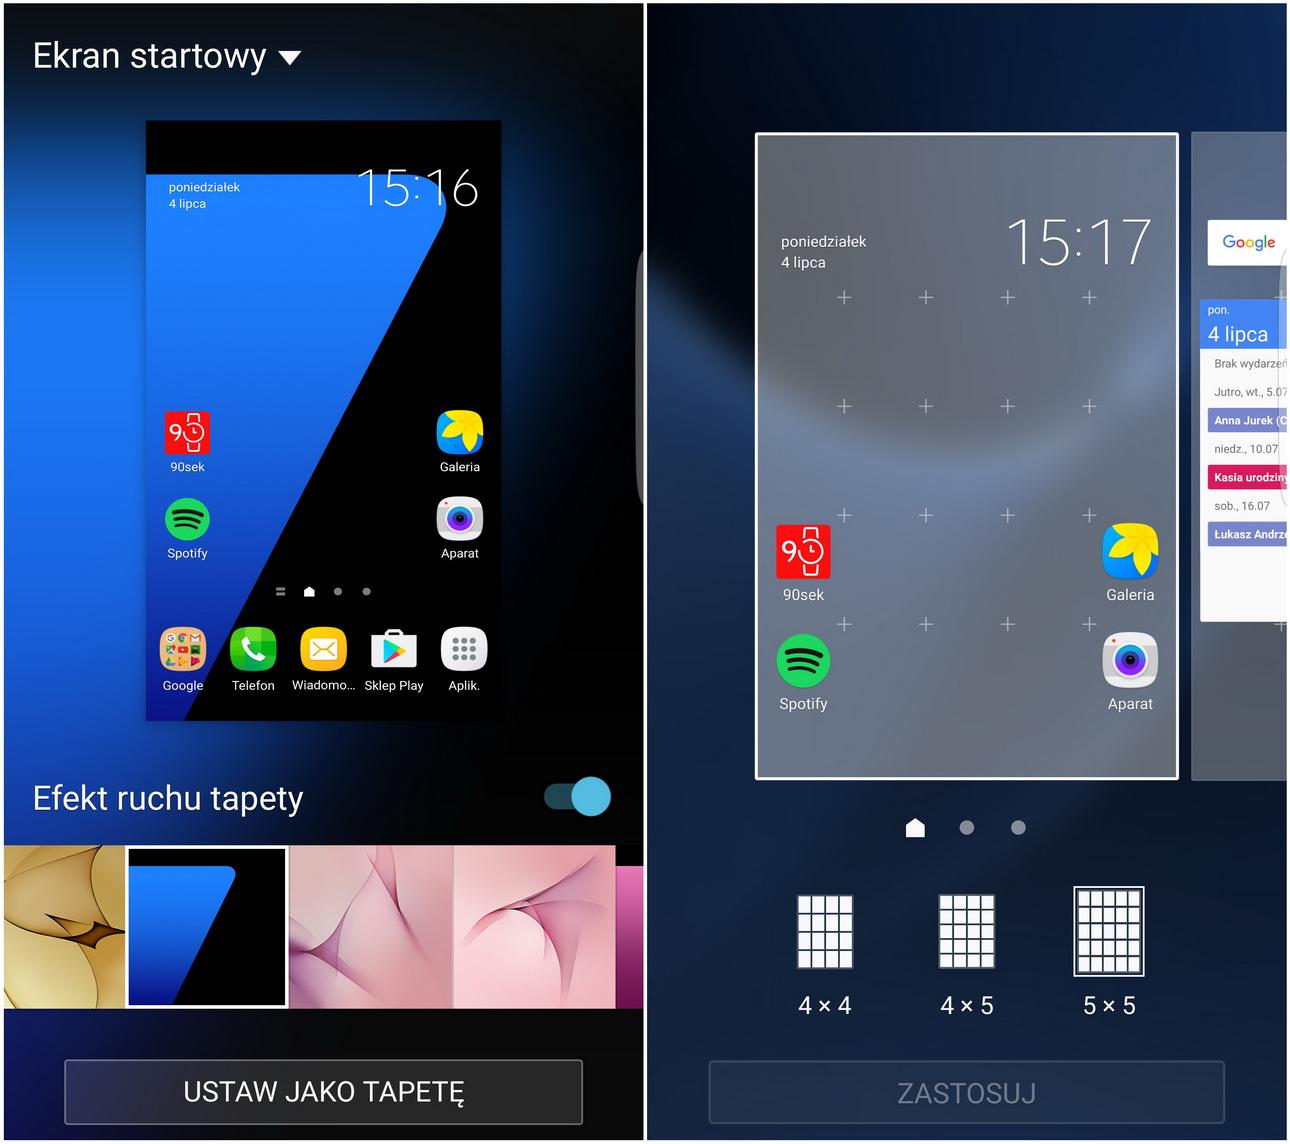 Samsung Galaxy S7 (SM-G935) TouchWiz - recenzja 90sekund.pl